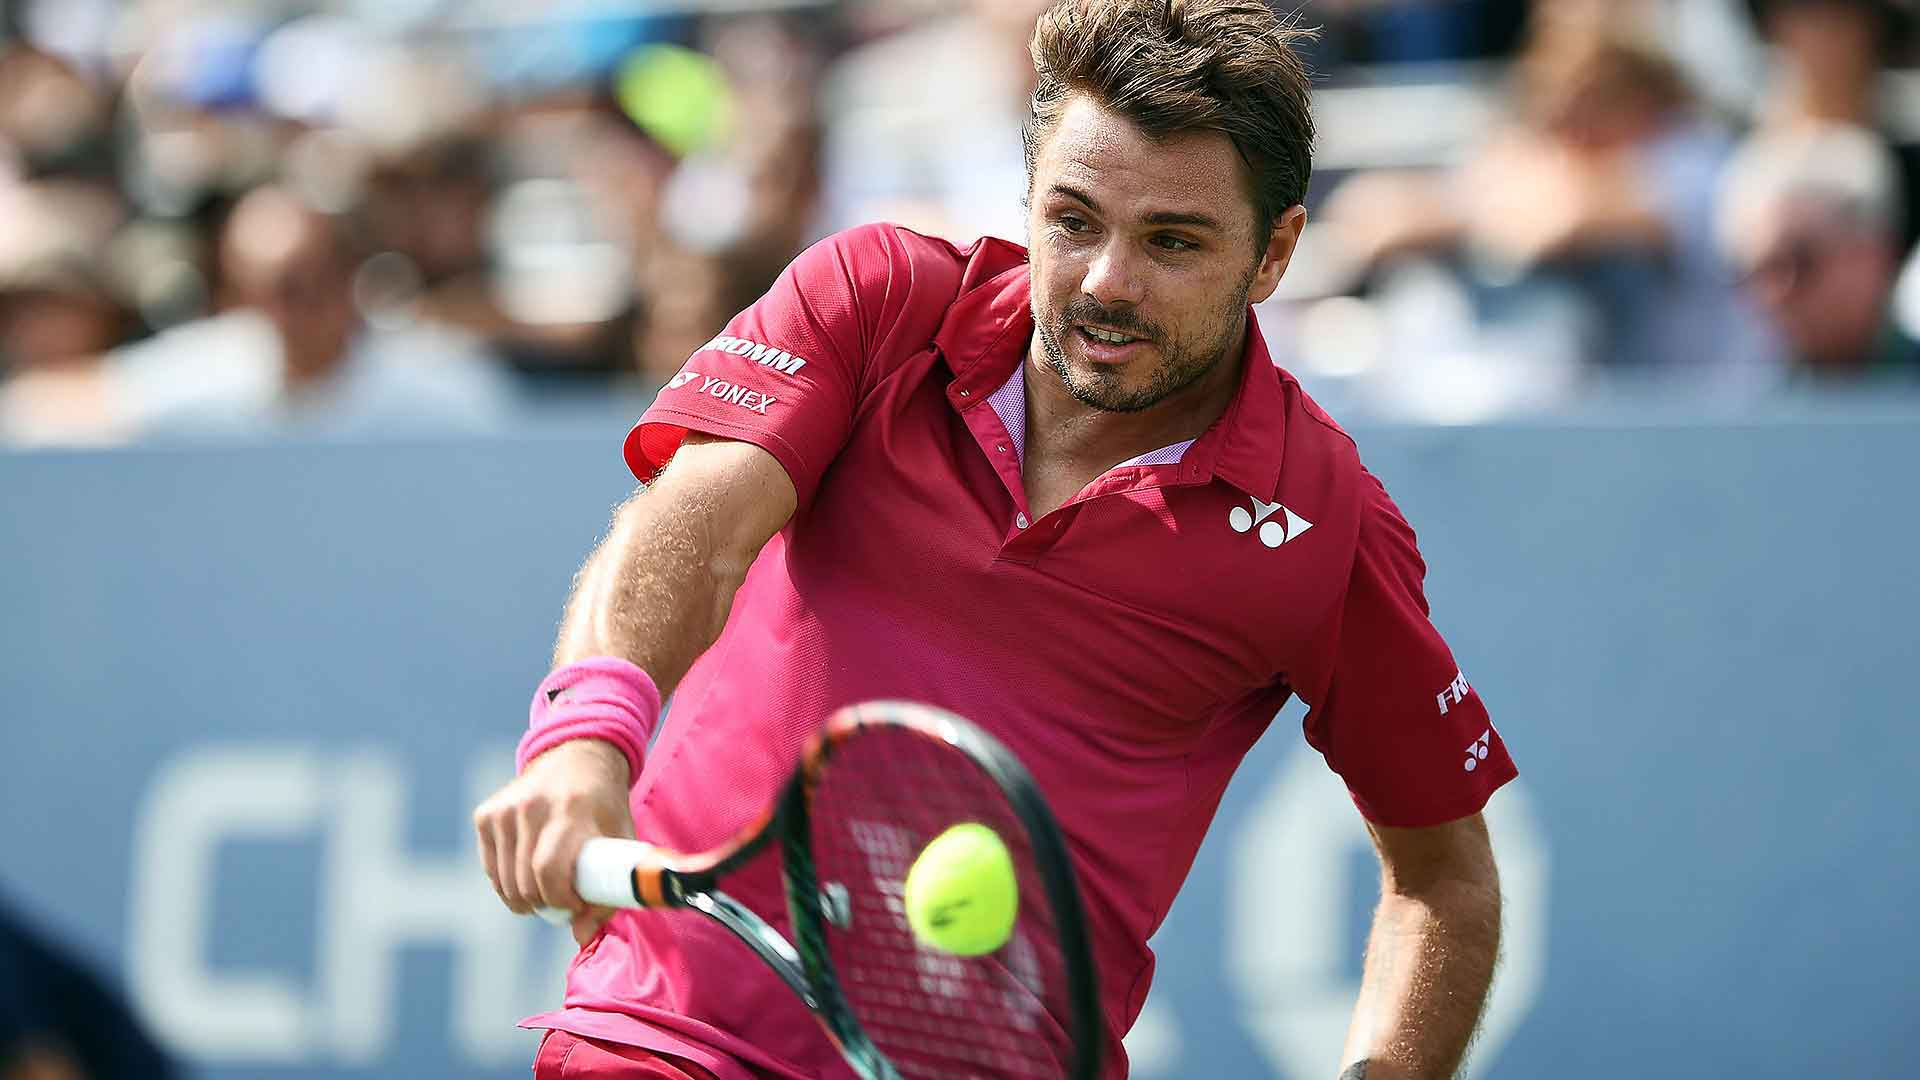 Wawrinka - US Open '16 - ATP